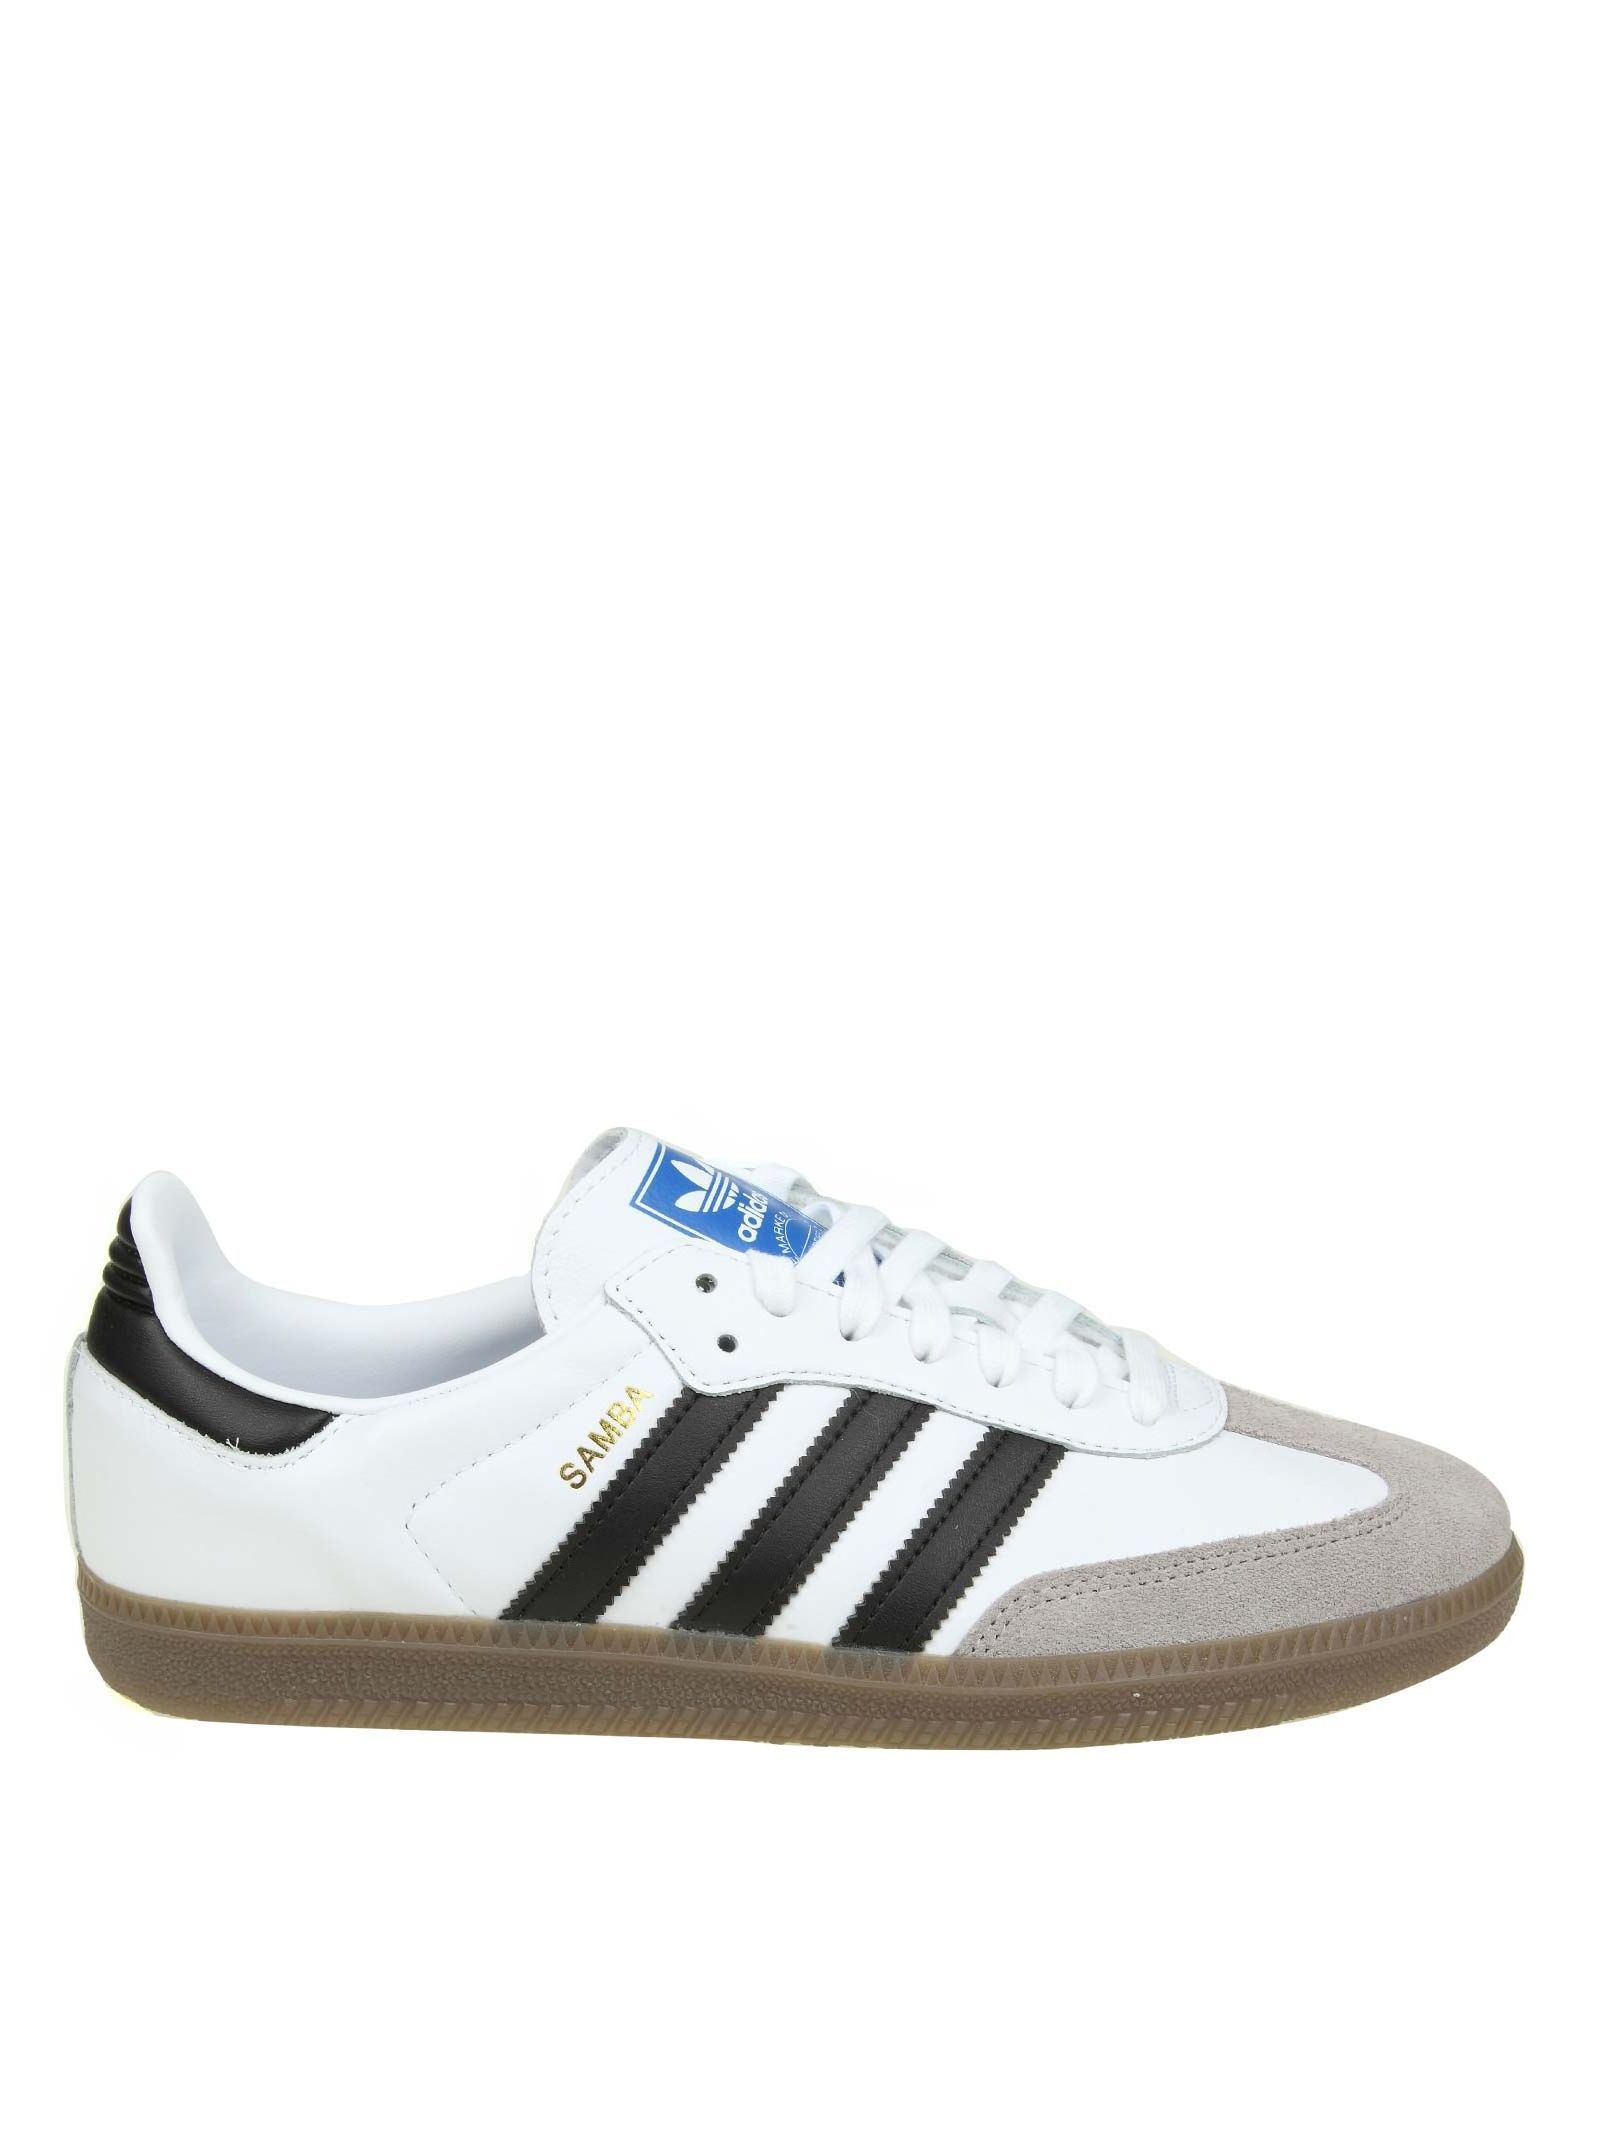 ADIDAS ORIGINALS RETRO Samba Herren Schuhe Spezial Vintage